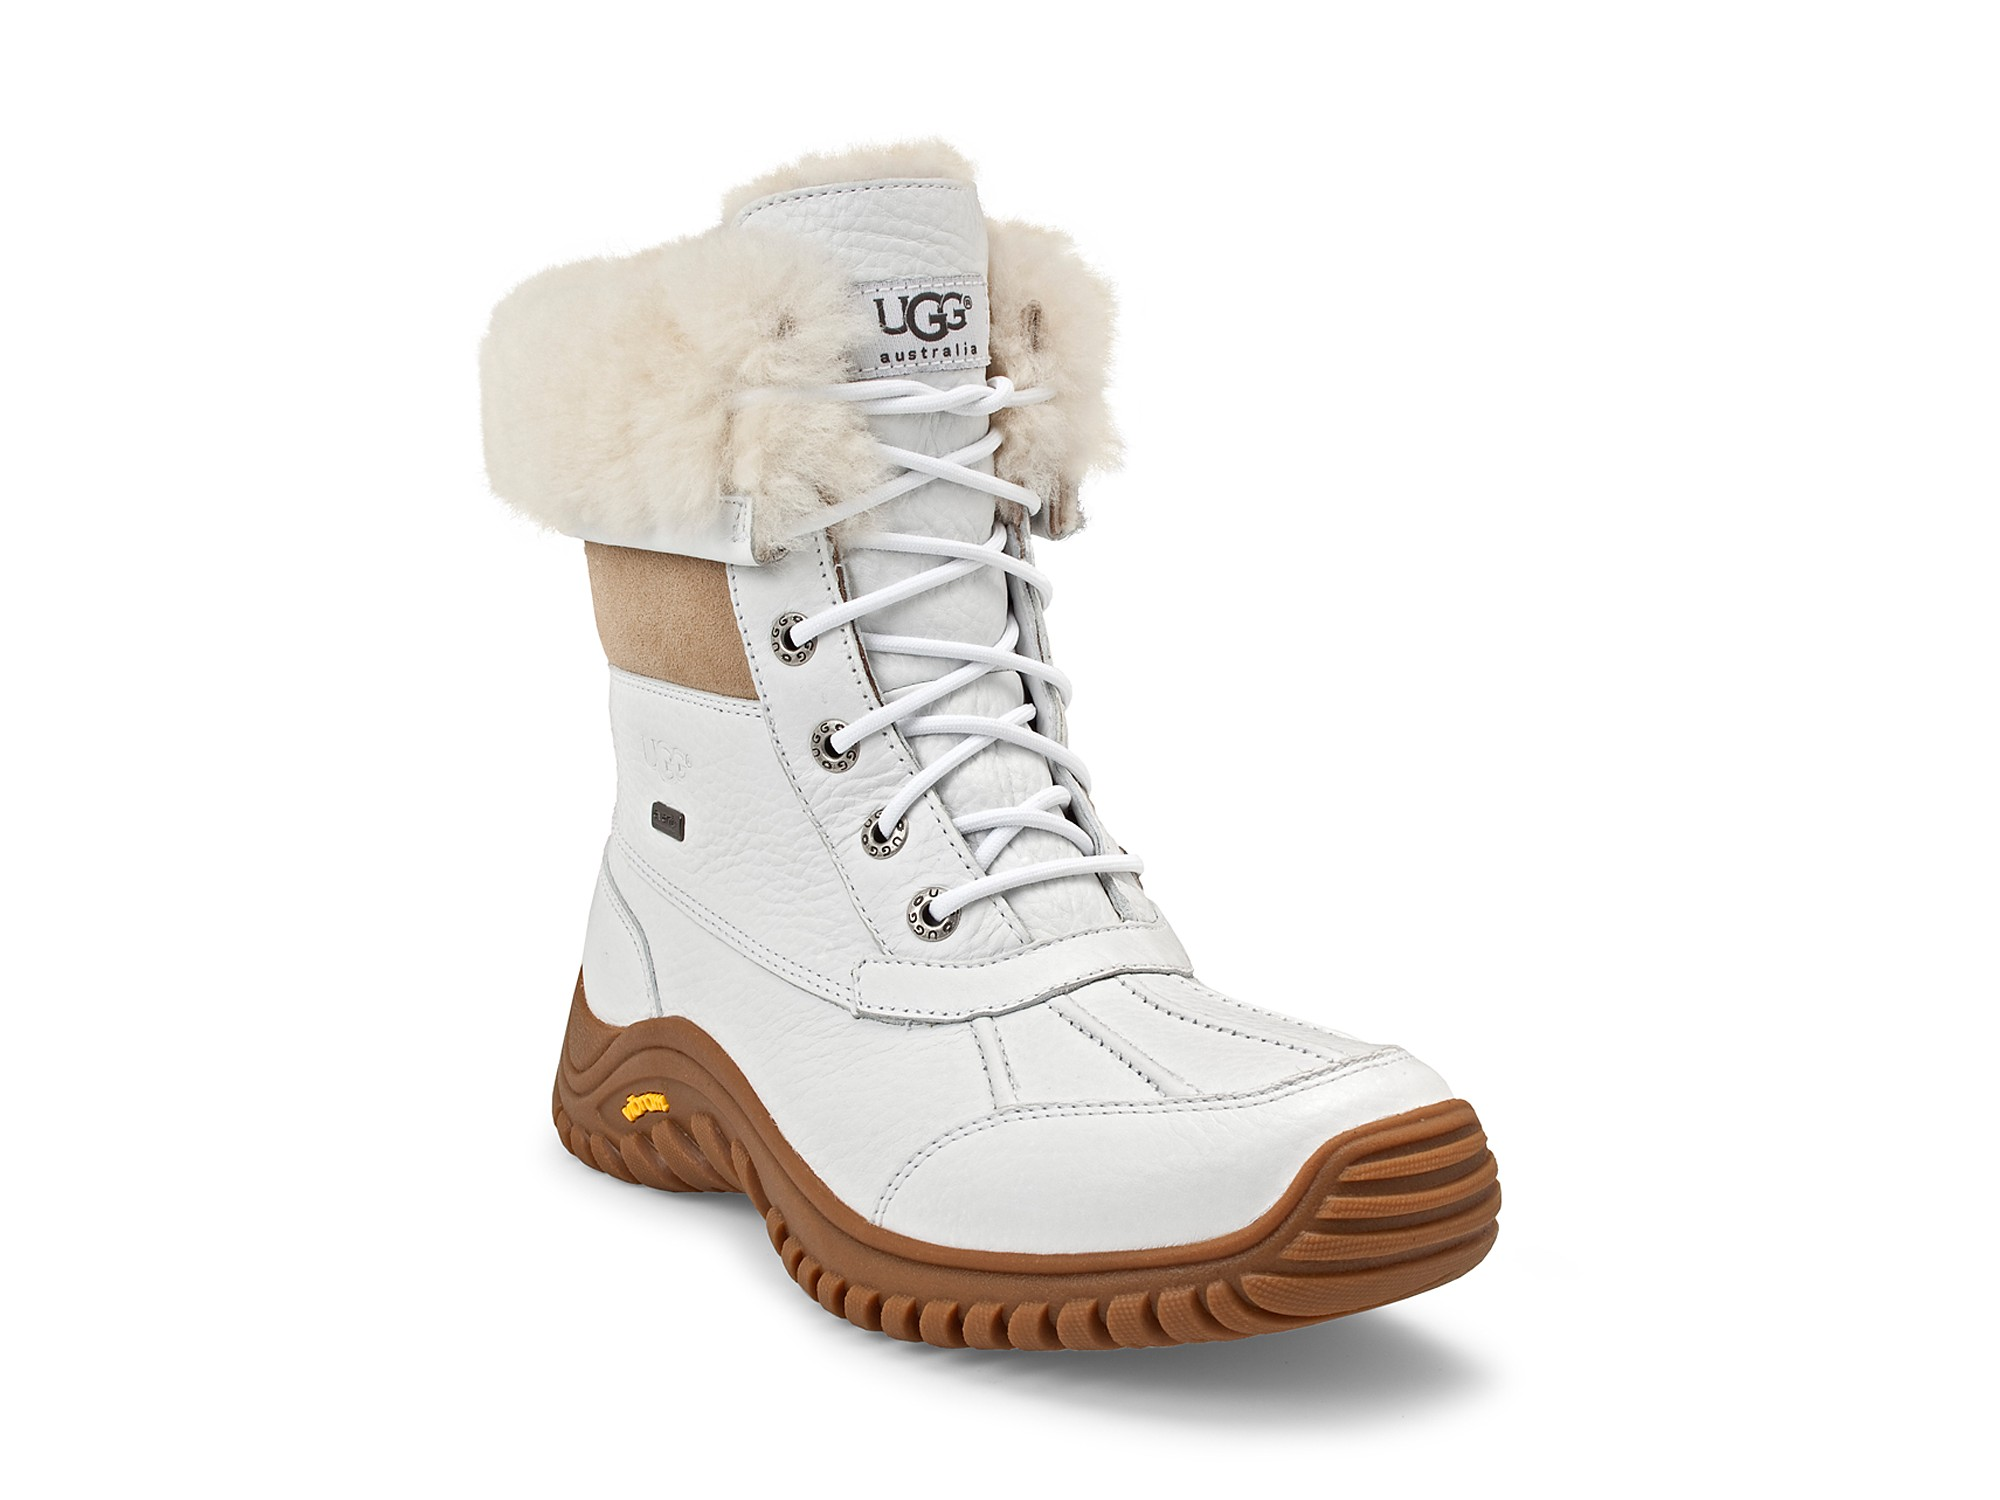 Ugg Adirondak Snow Boots In White Lyst